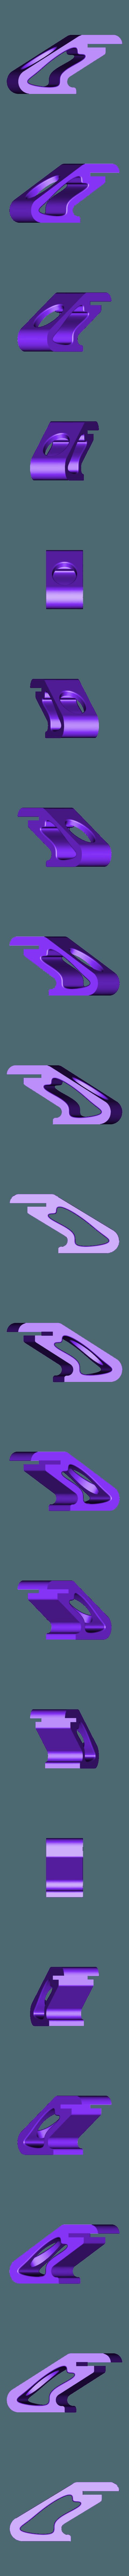 Open.stl Download free STL file Open • 3D printing model, Ysbelia